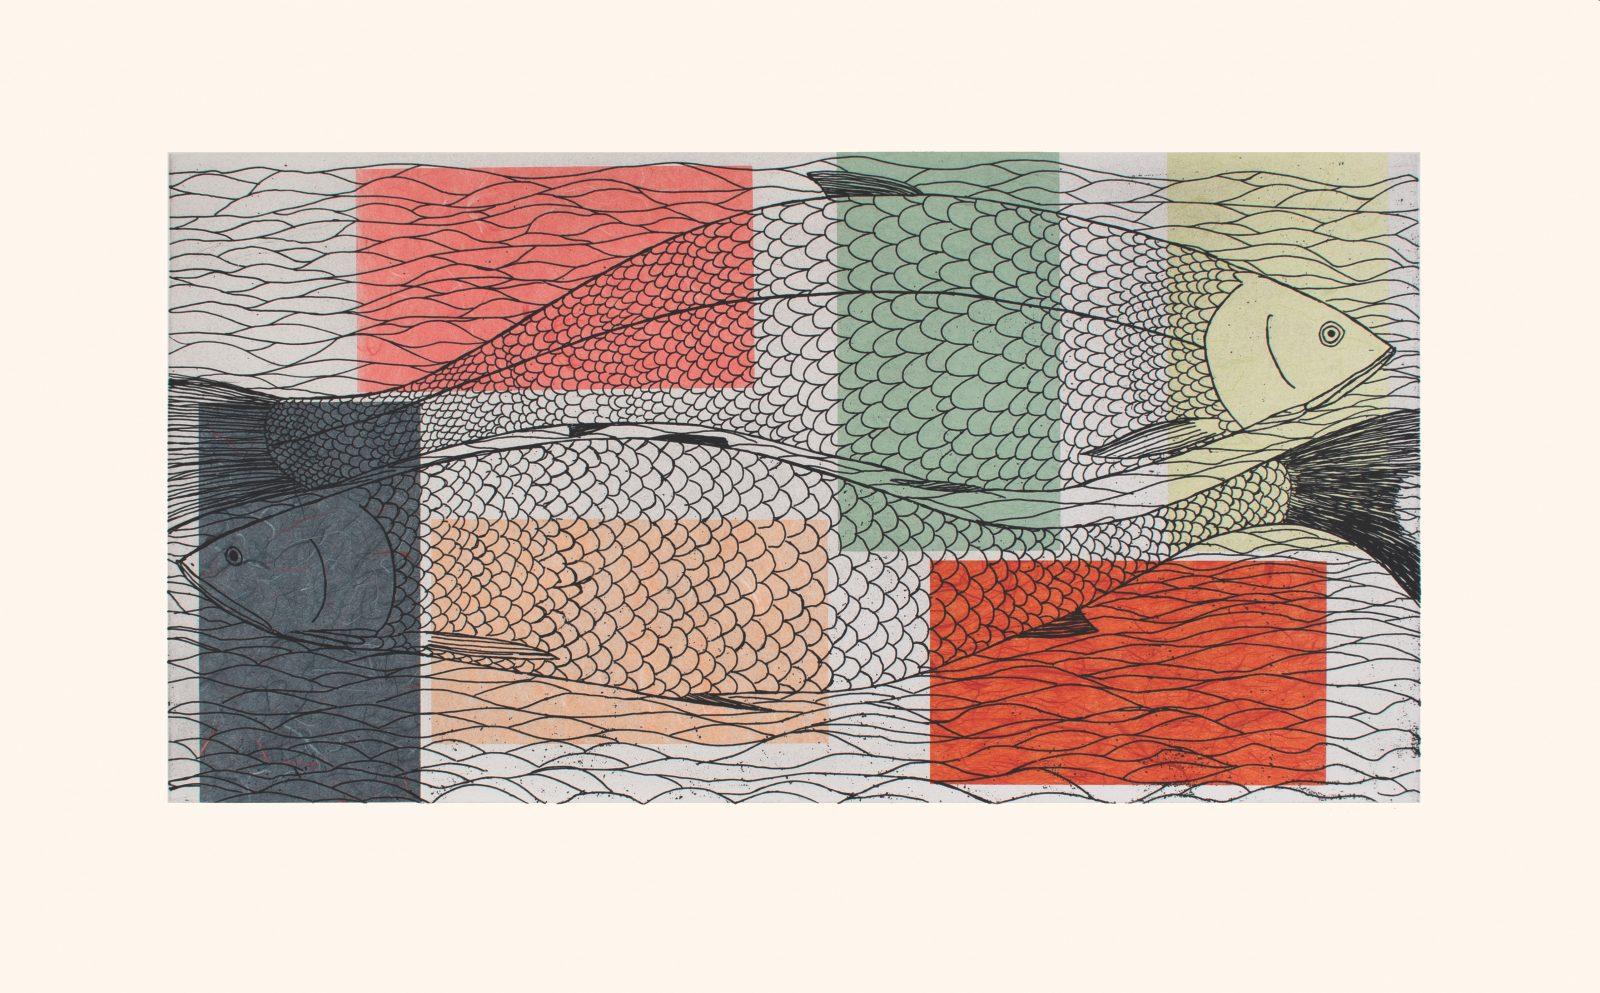 NINGIUKULU TEEVEE Passing Char Cape Dorset Print 2021